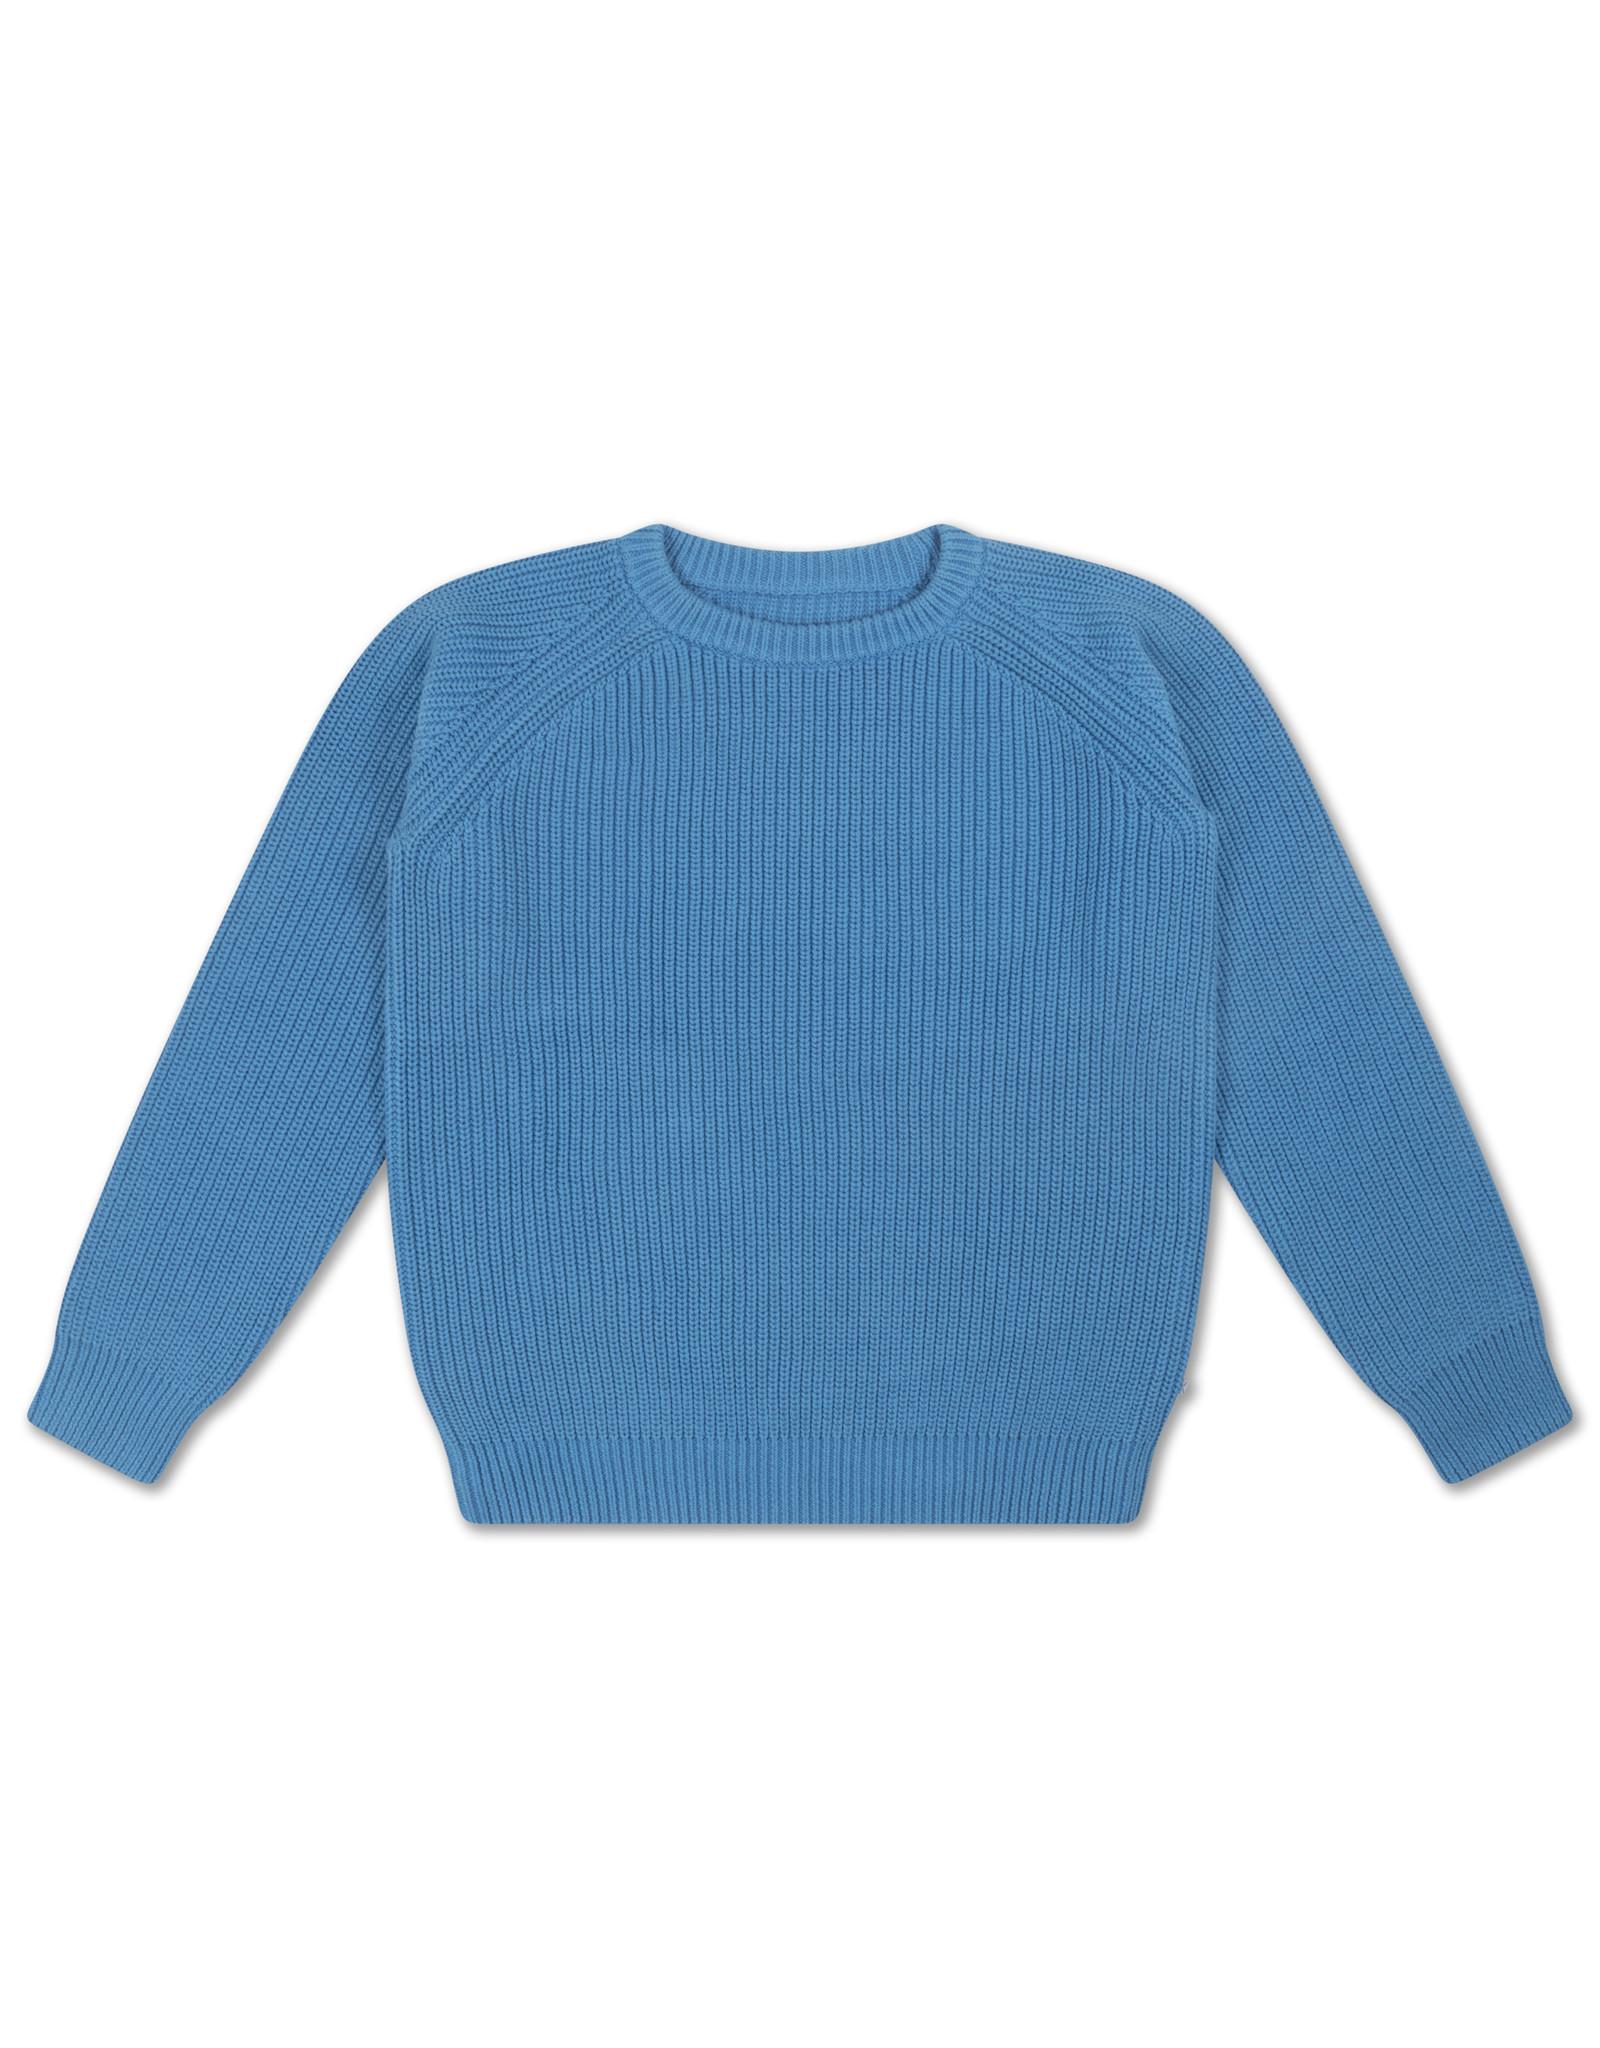 Repose Repose SS21 63 Knit Sweater bold blue